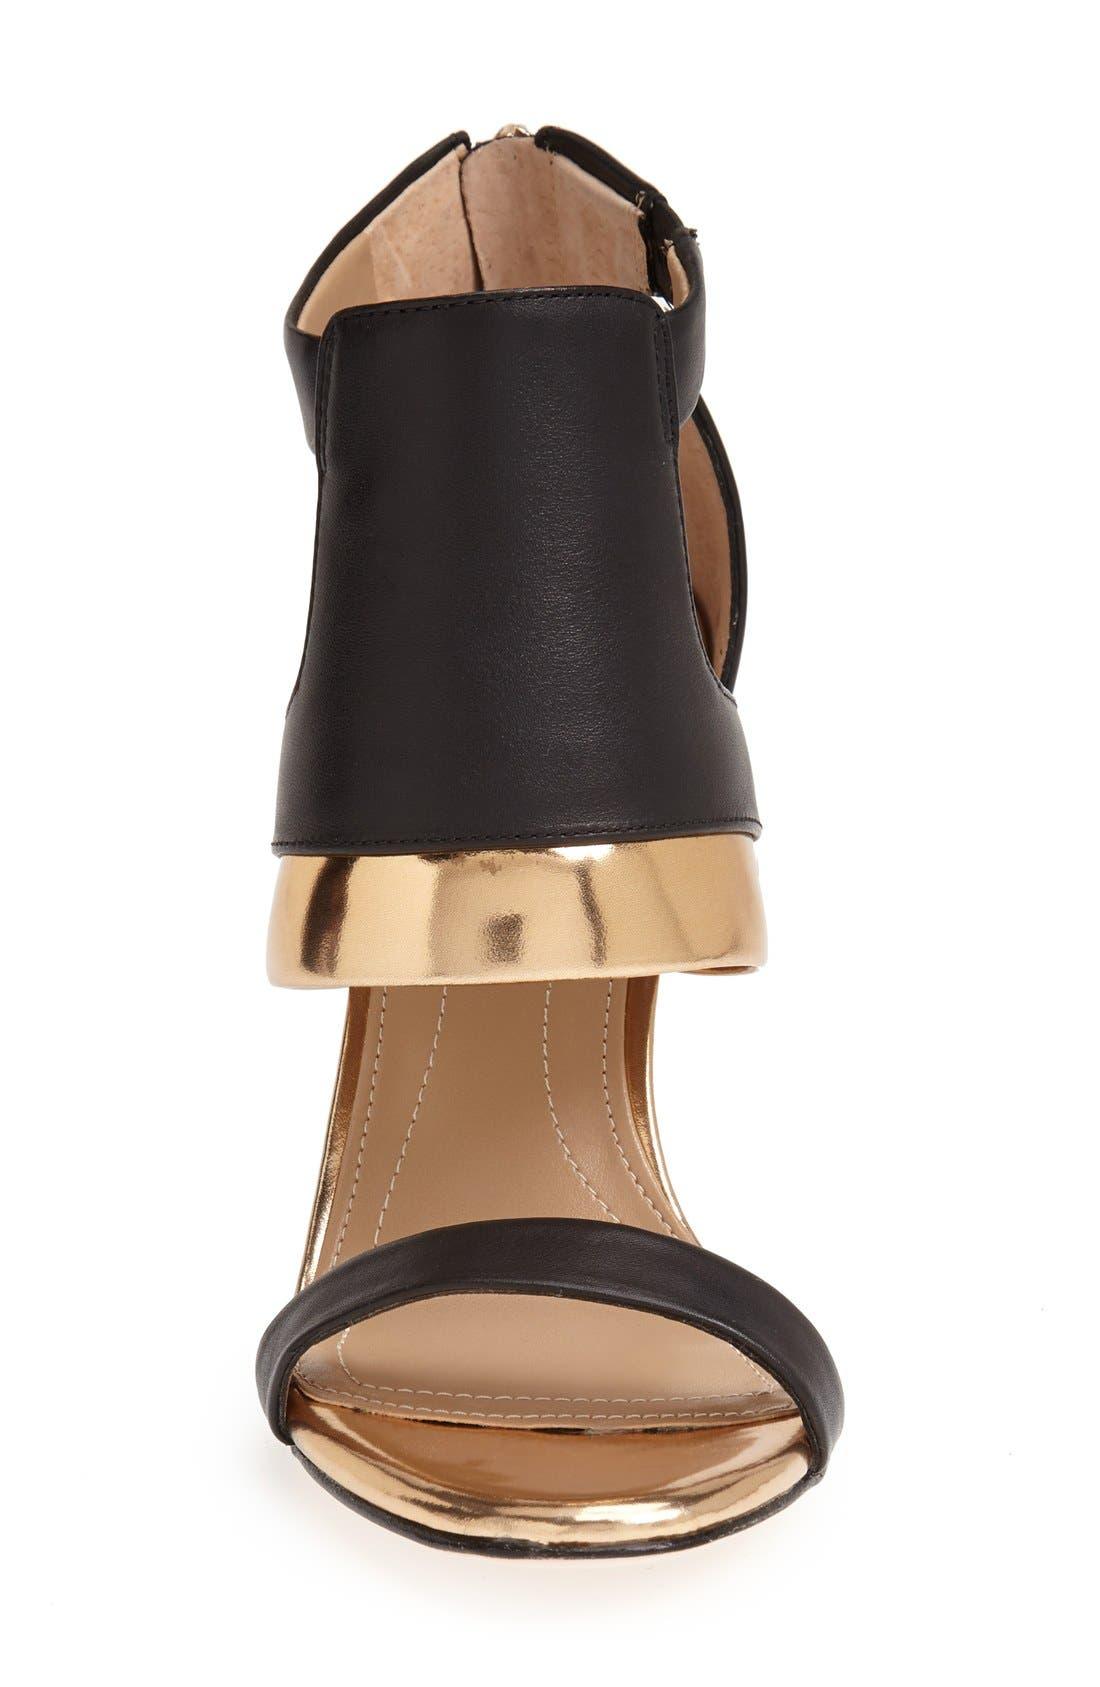 Alternate Image 3  - BCBGMAXAZRIA 'Jetss' Sandal (Women)